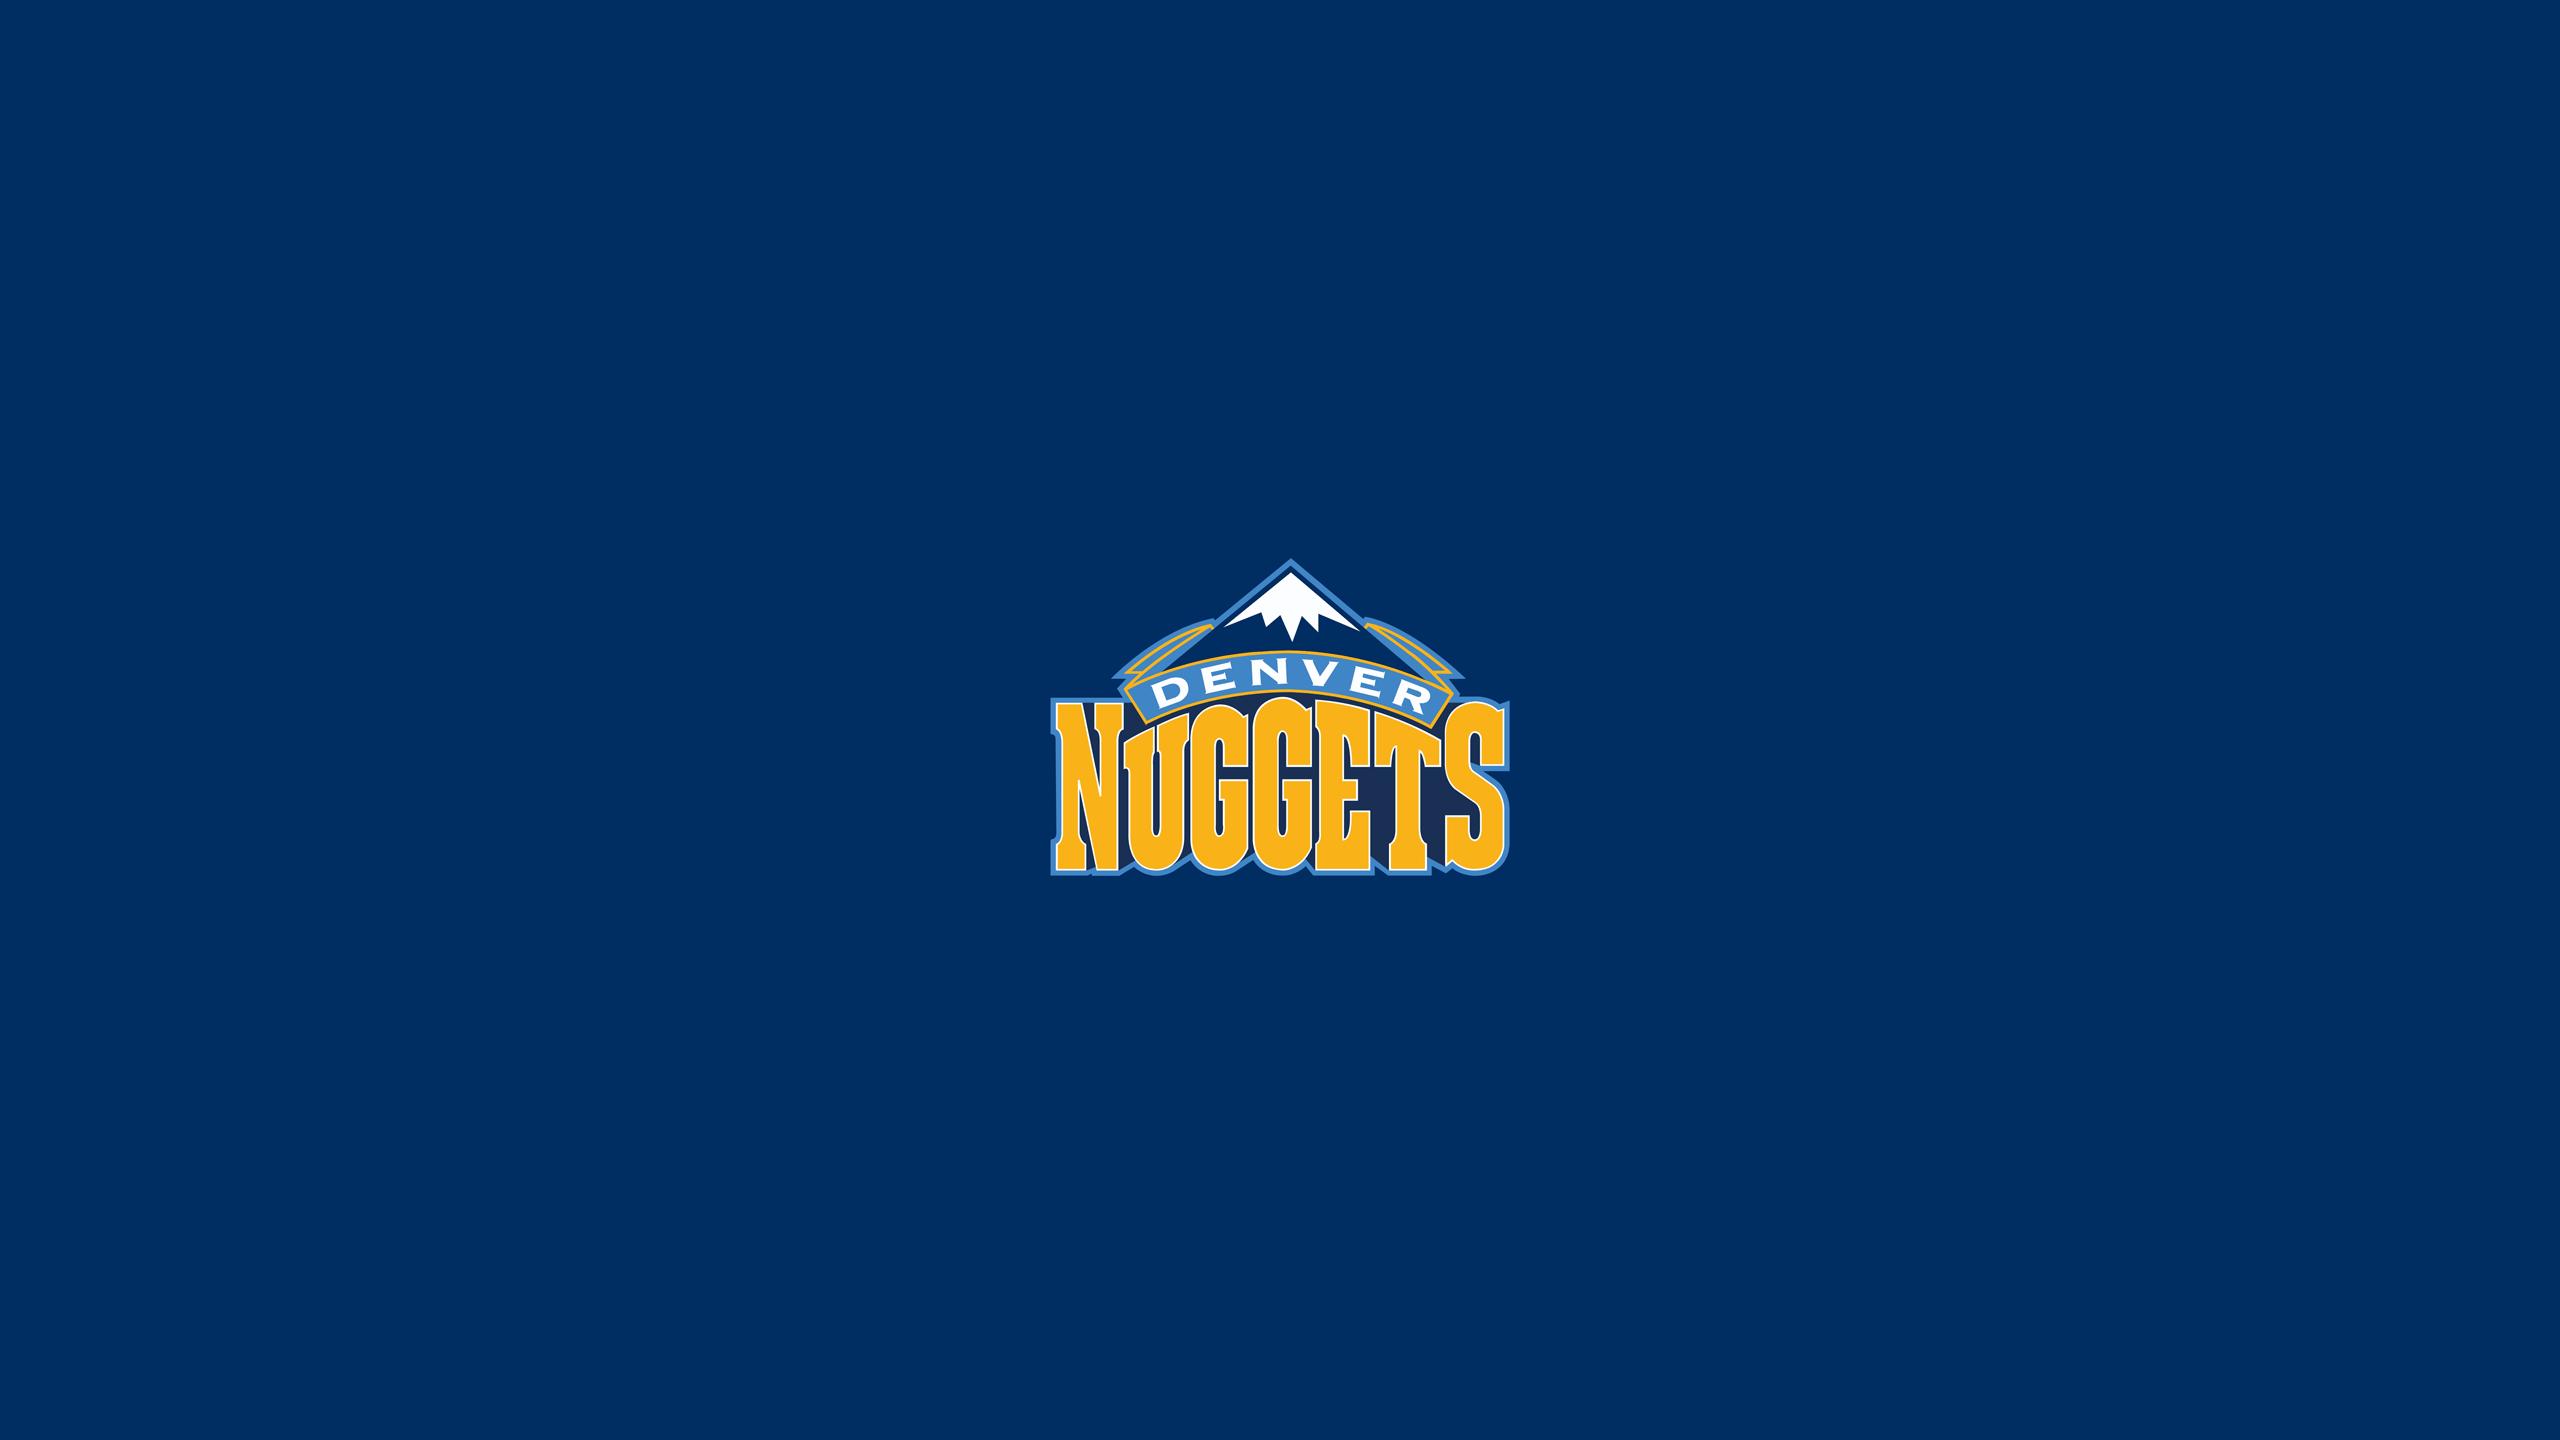 Denver Nuggets Desktop Wallpapers Wallpaper Cave